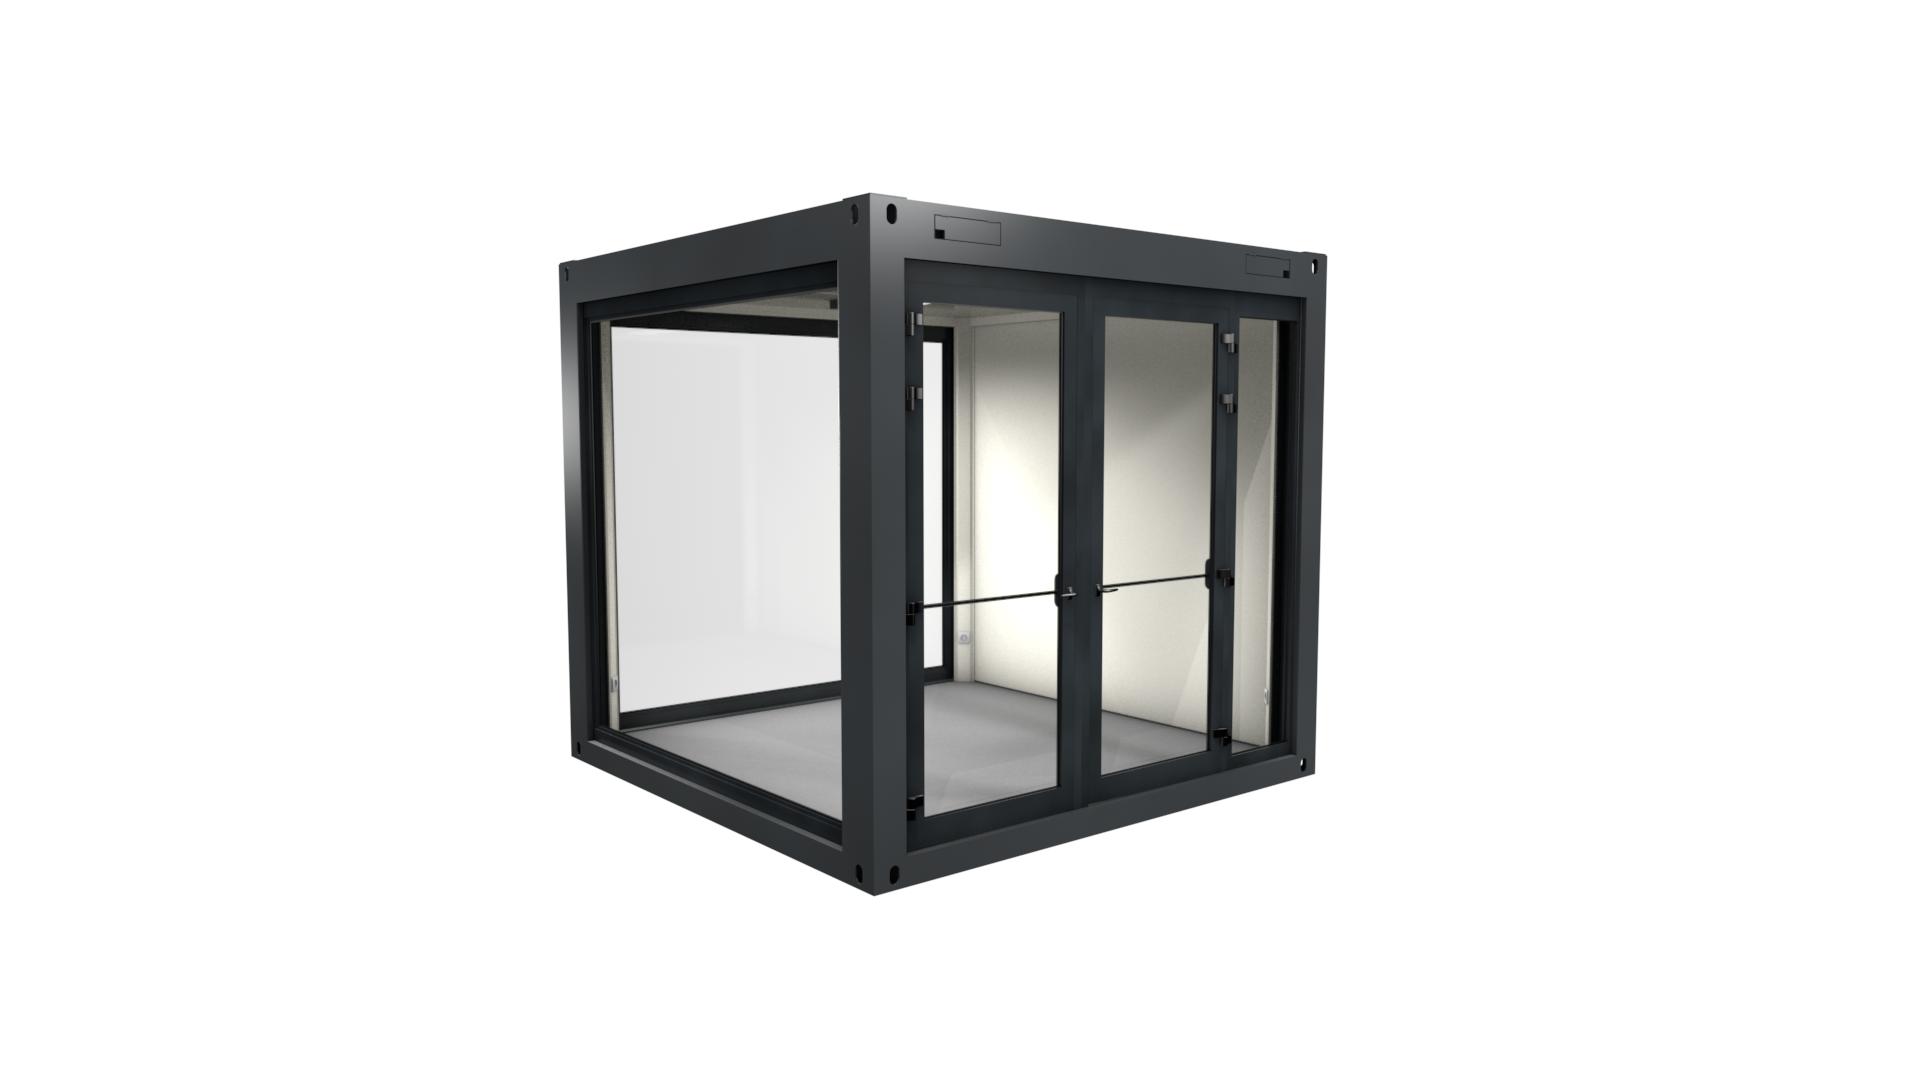 Cube 1 - Ansicht 1